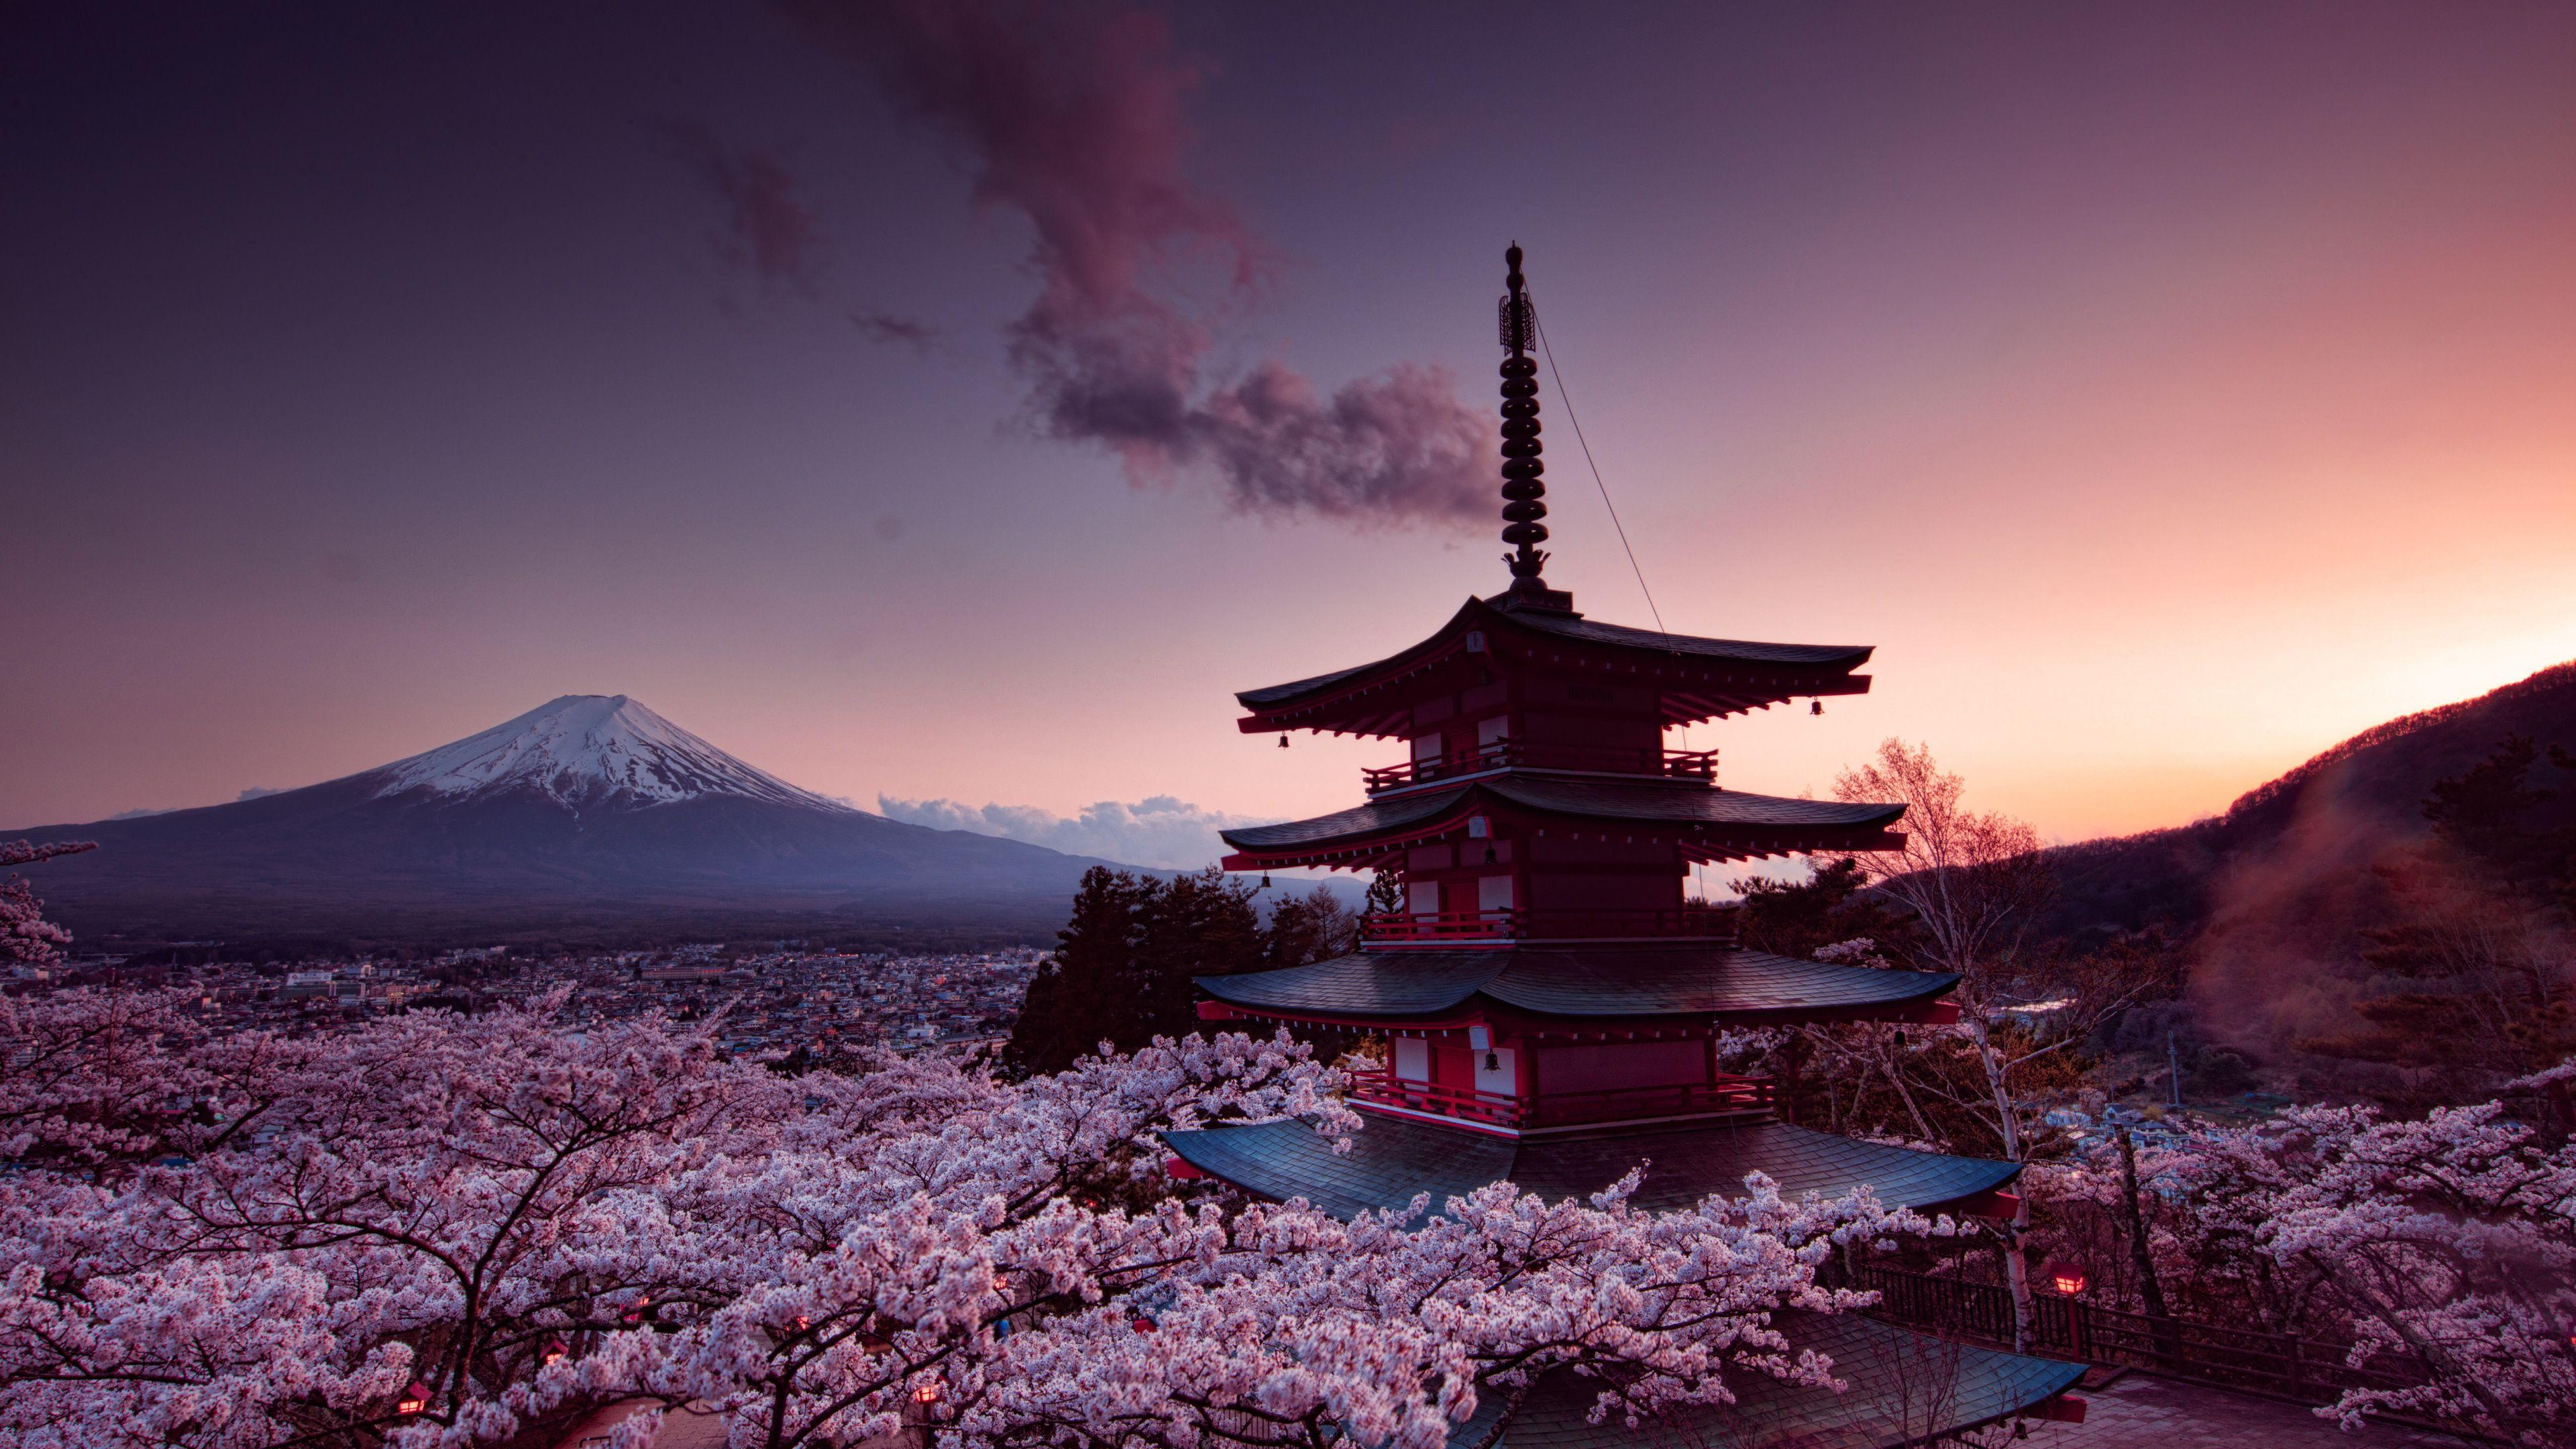 Japan Dual Monitor Wallpapers Top Free Japan Dual Monitor Backgrounds Wallpaperaccess